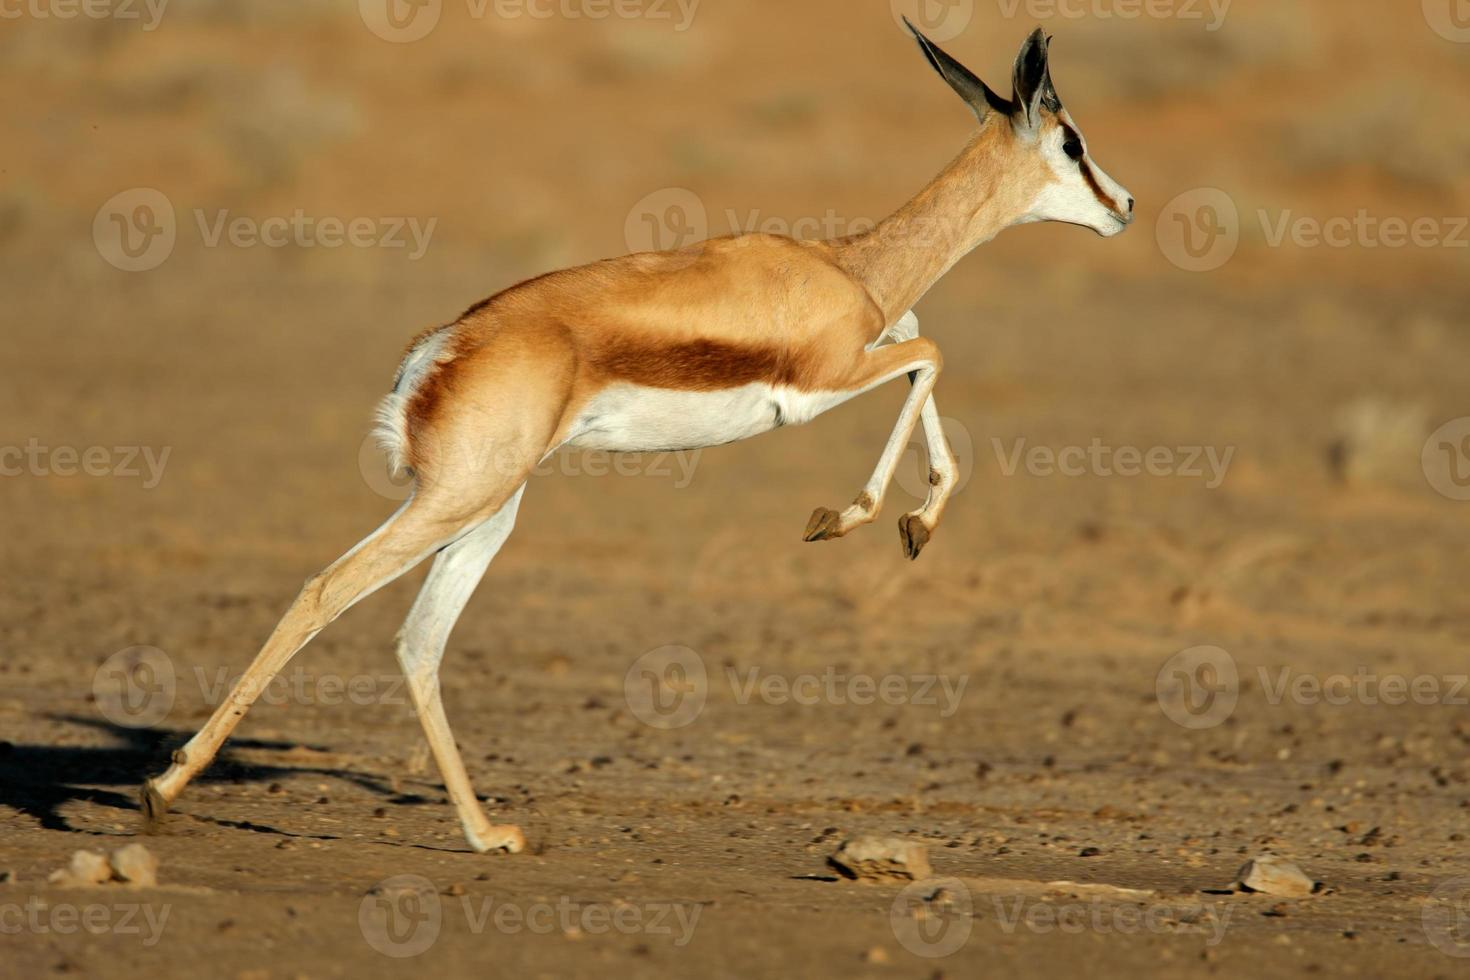 corriendo antílope springbok foto